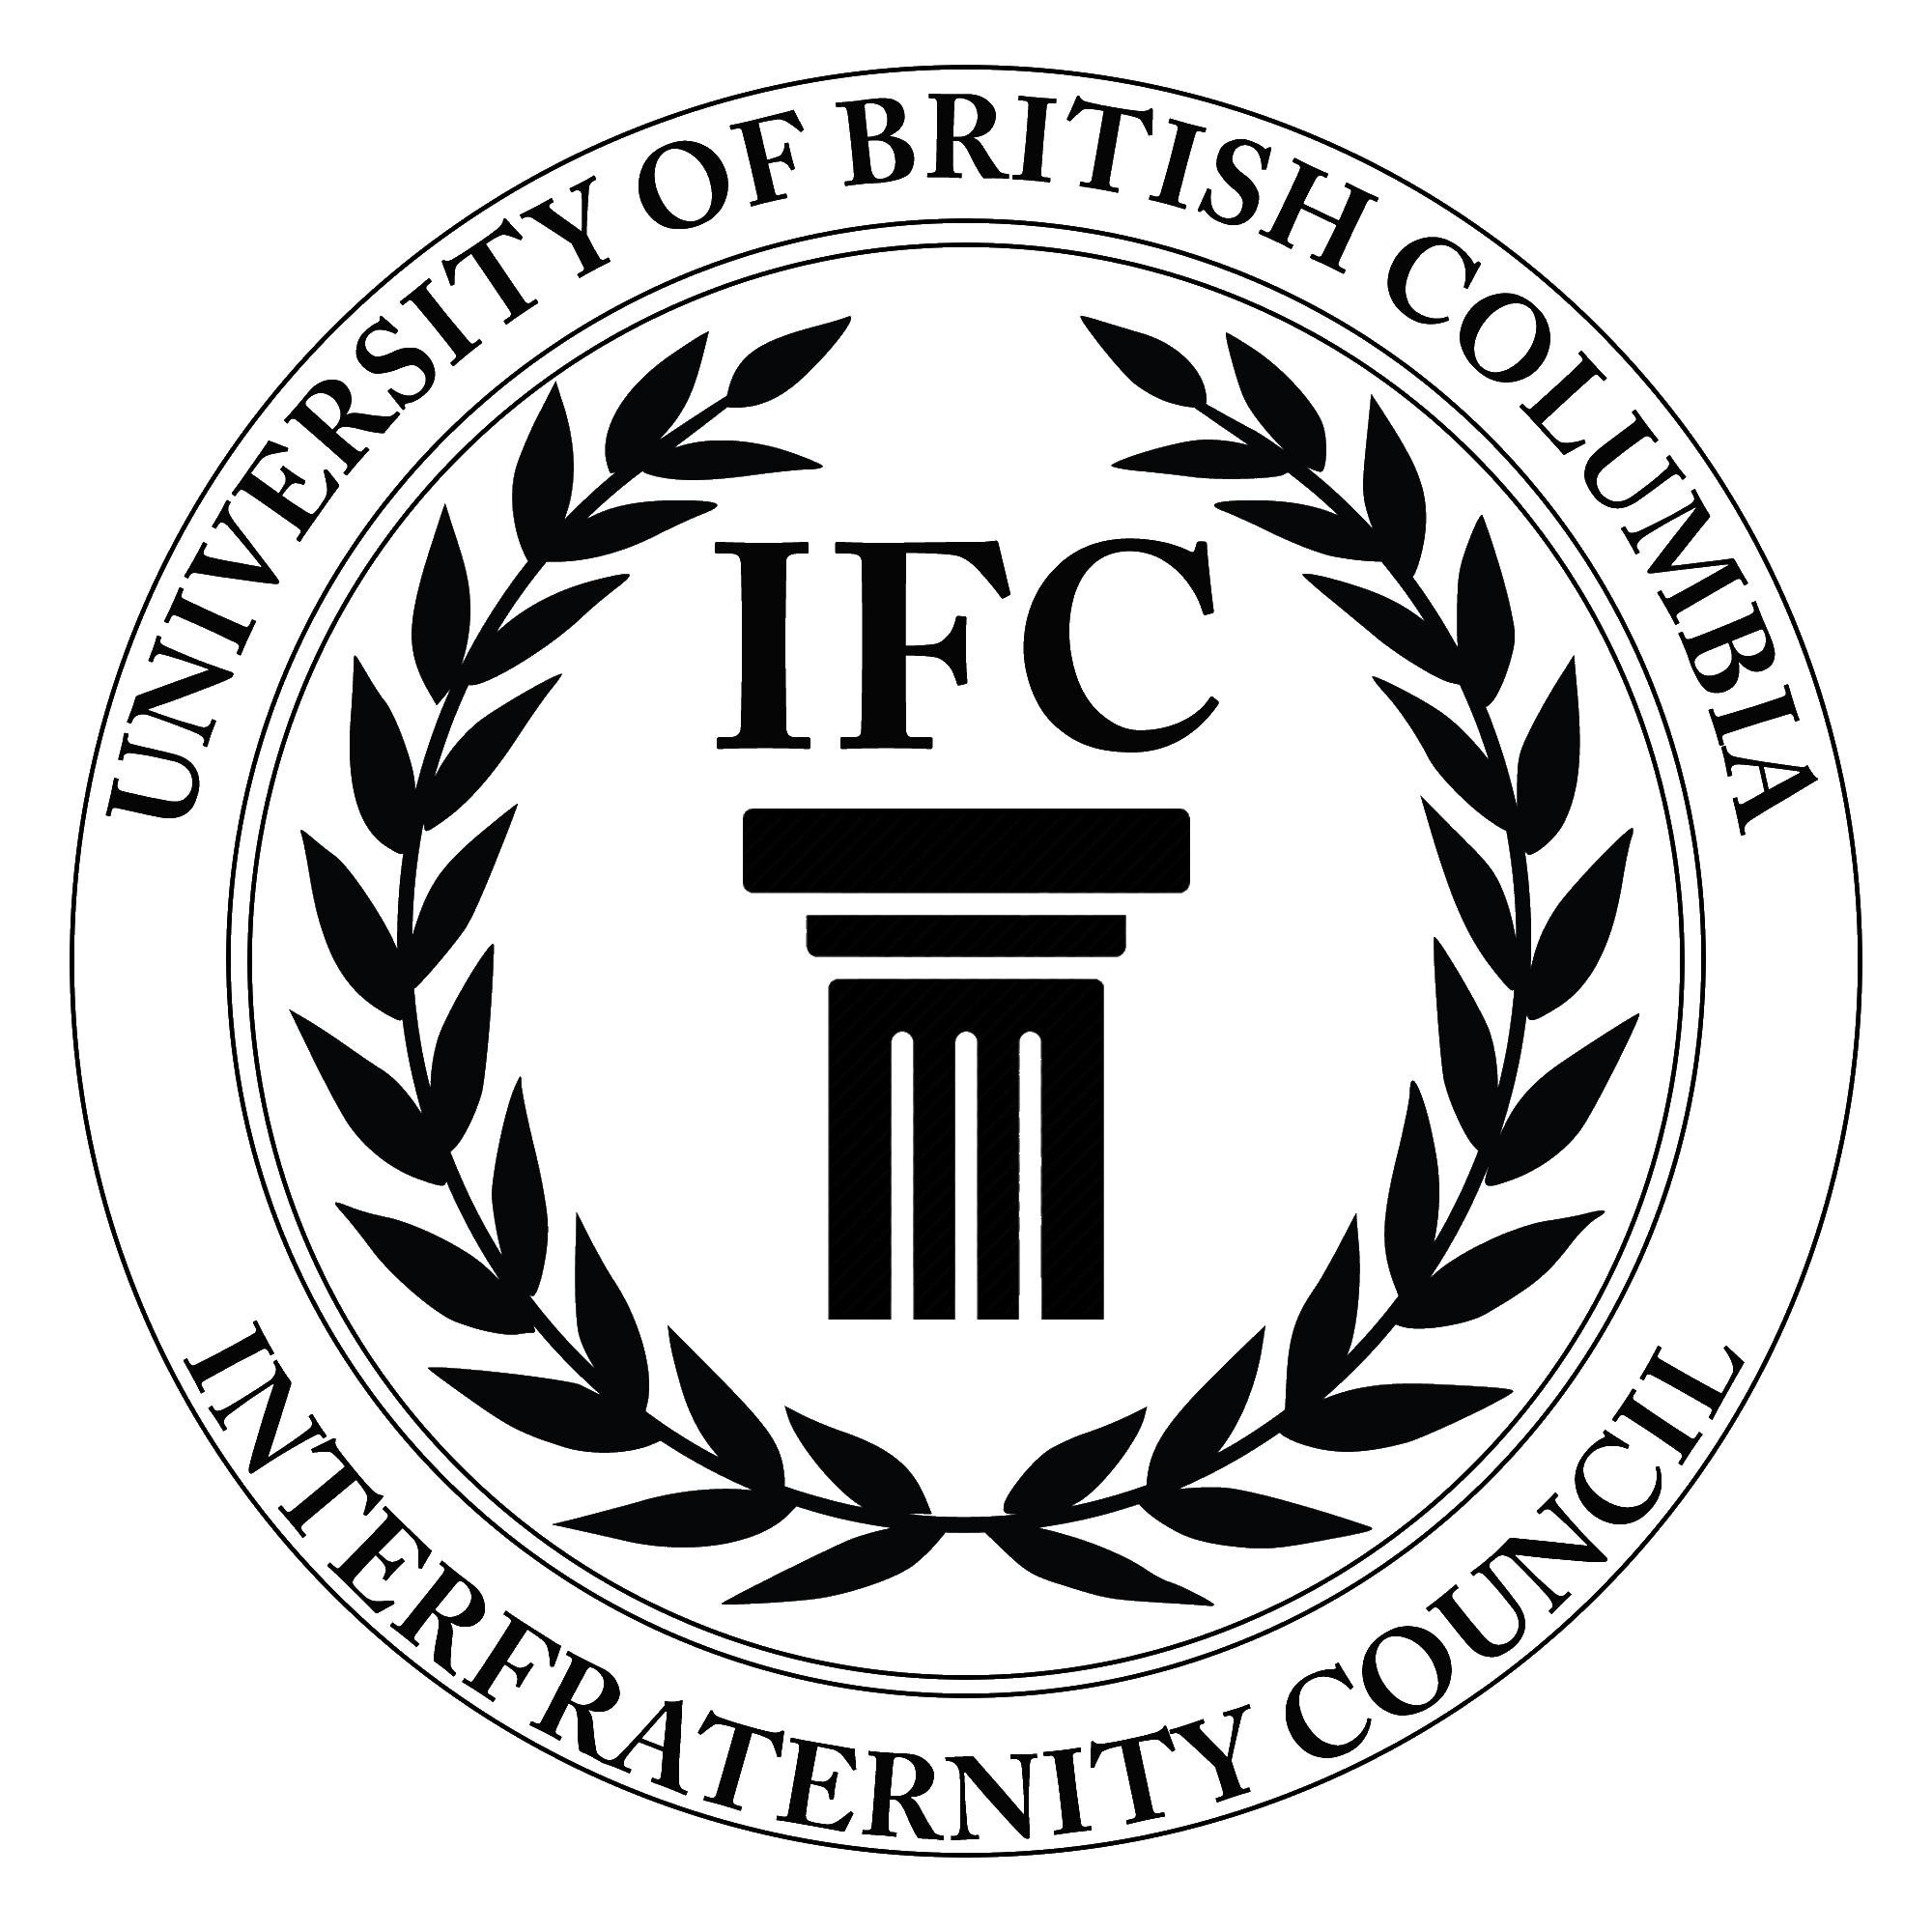 UBC IFC – UBC INTERFRATERNITY COUNCIL